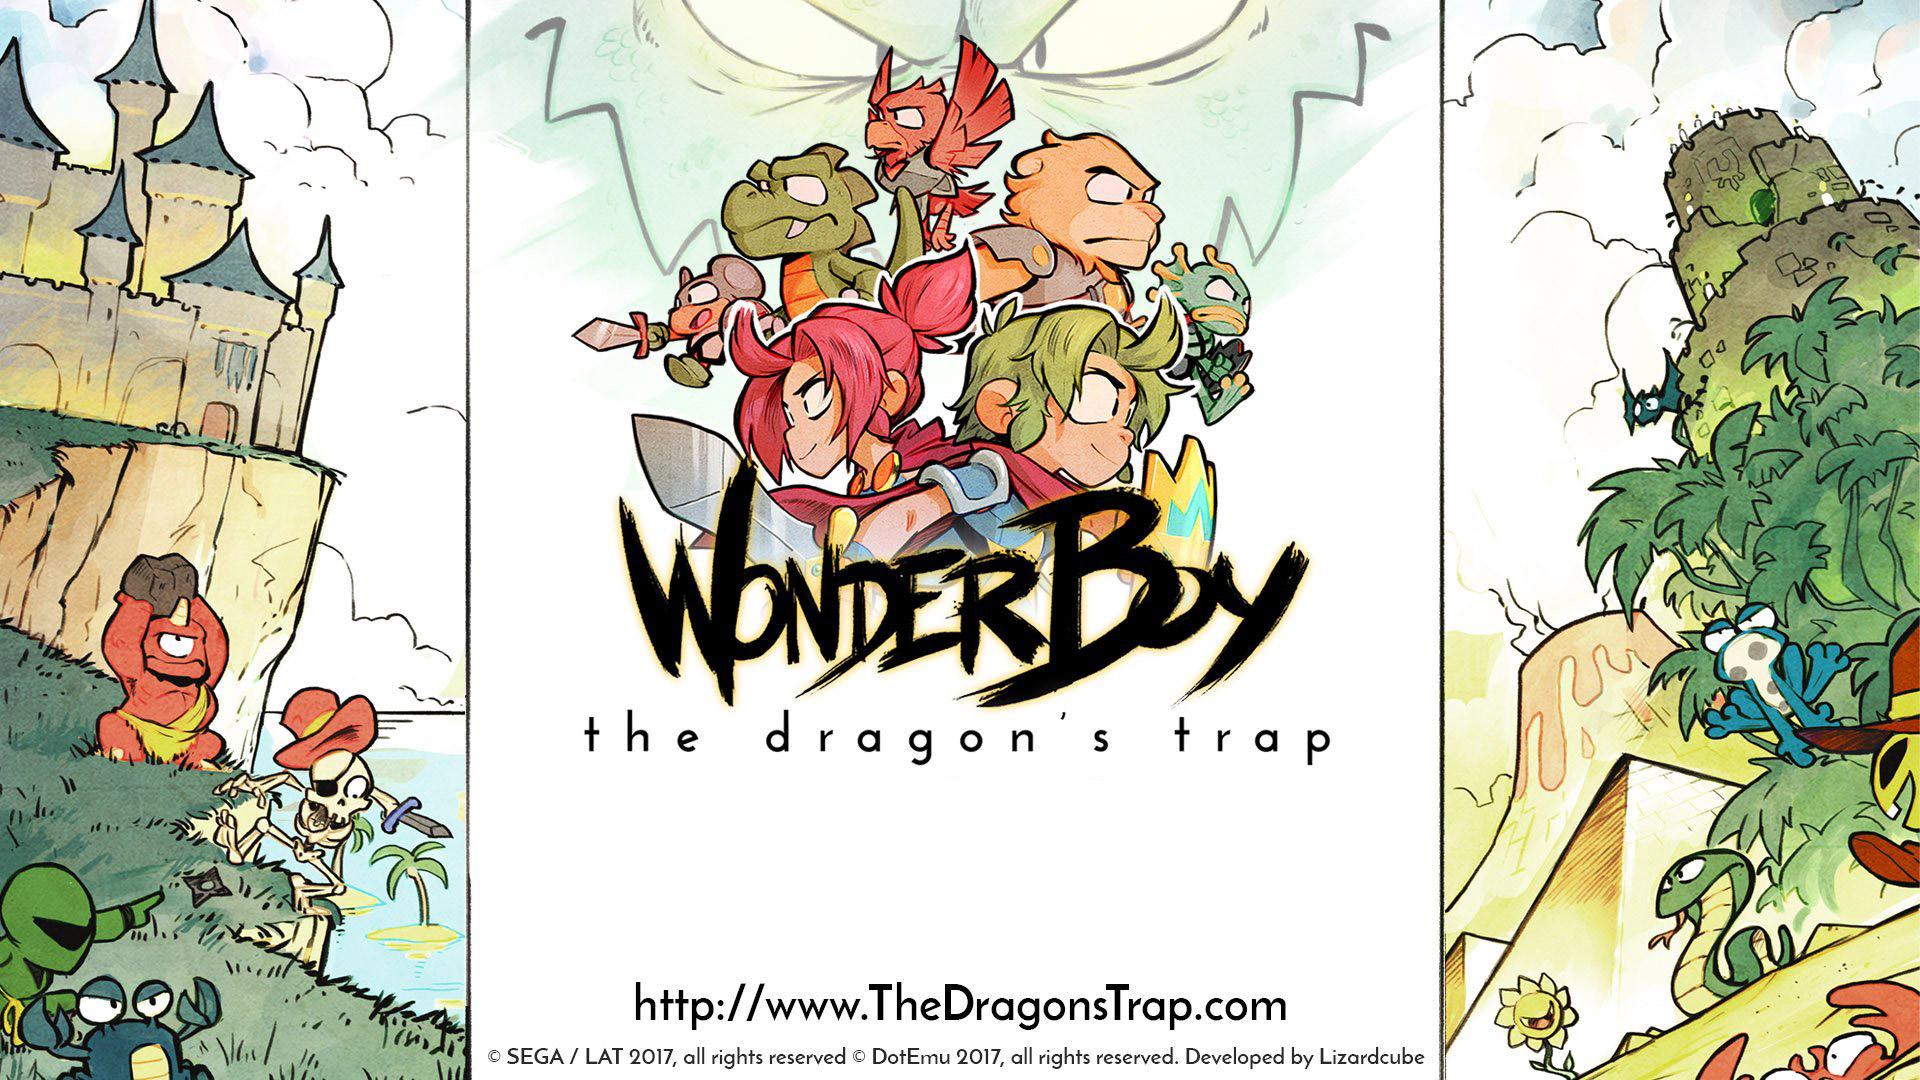 Wonder Boy: The Dragon's Trap Wallpaper in 1920x1080